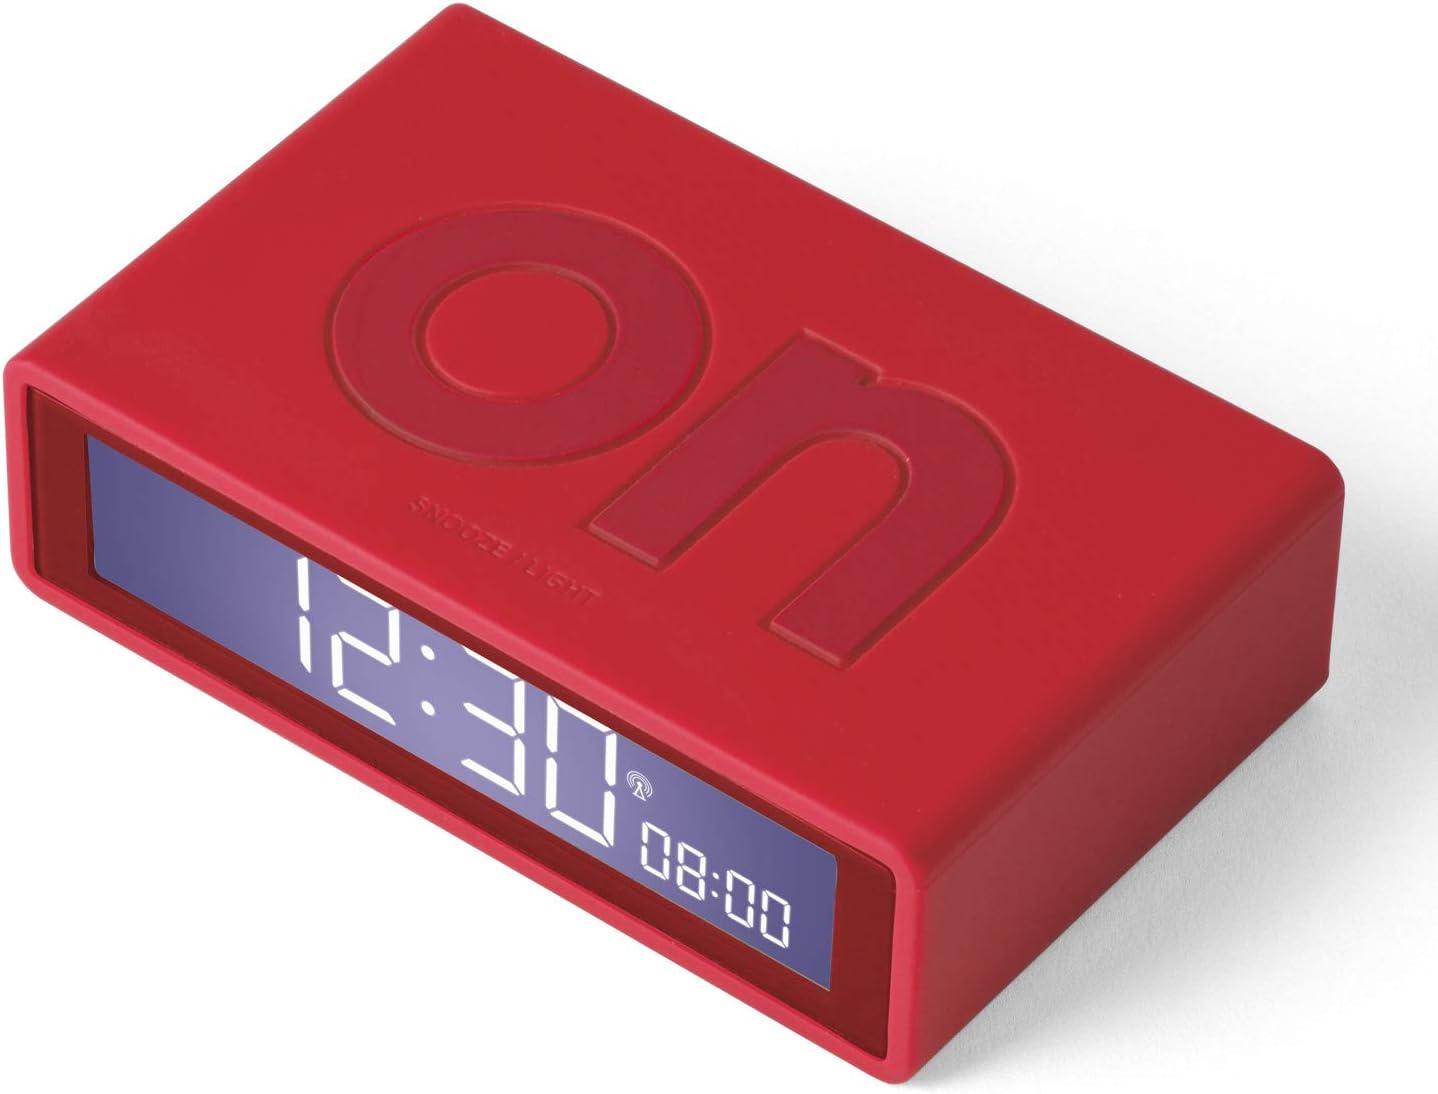 Lexon Flip Plus Reversible LCD Alarm Cheap mail order sales security - Controlled Re Radio Clock